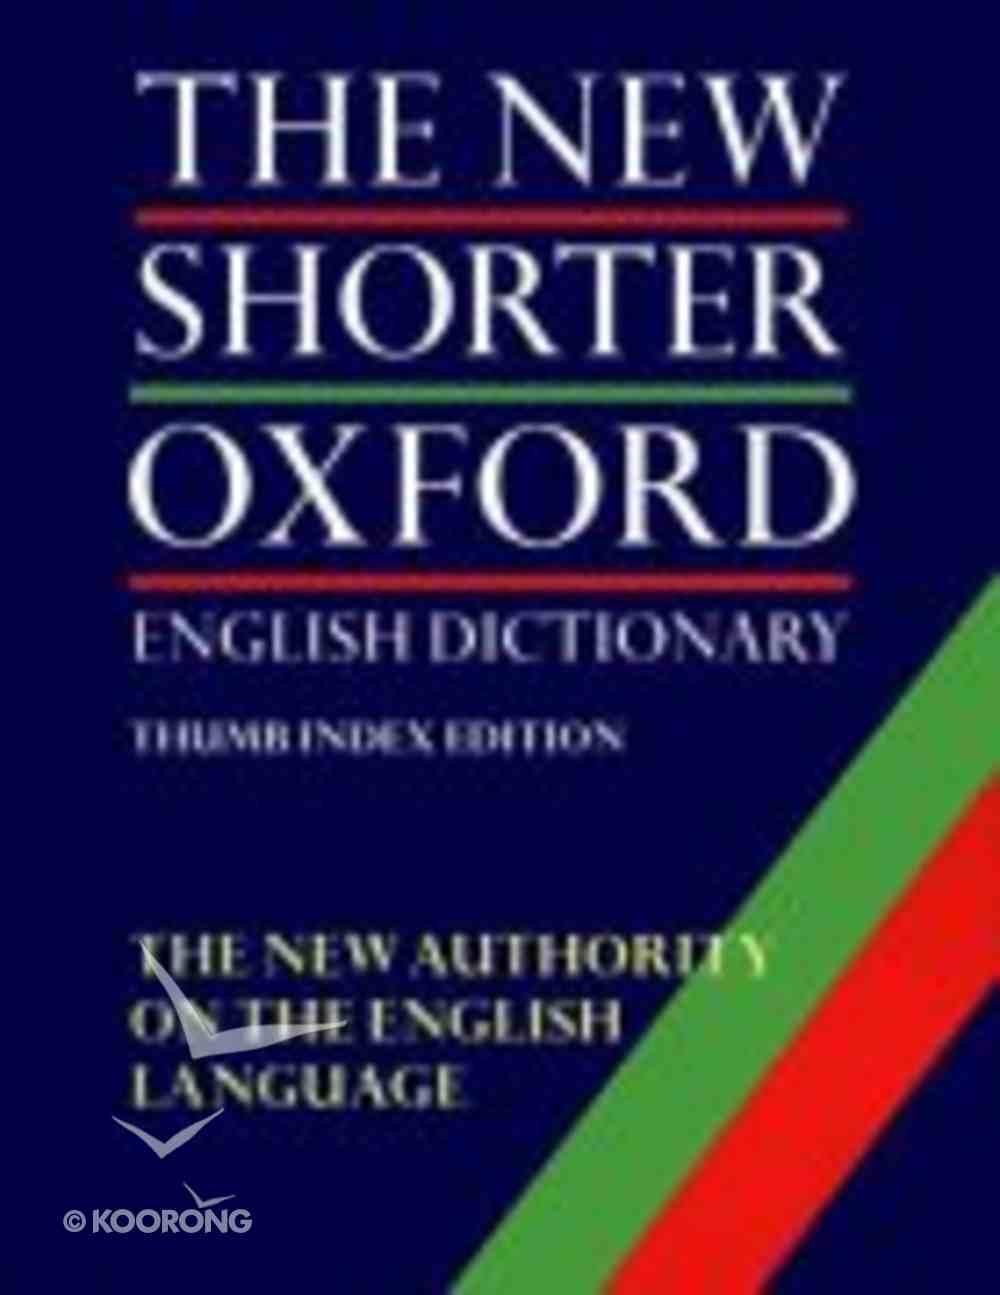 New Shorter Oxford English Dictionary Hardback